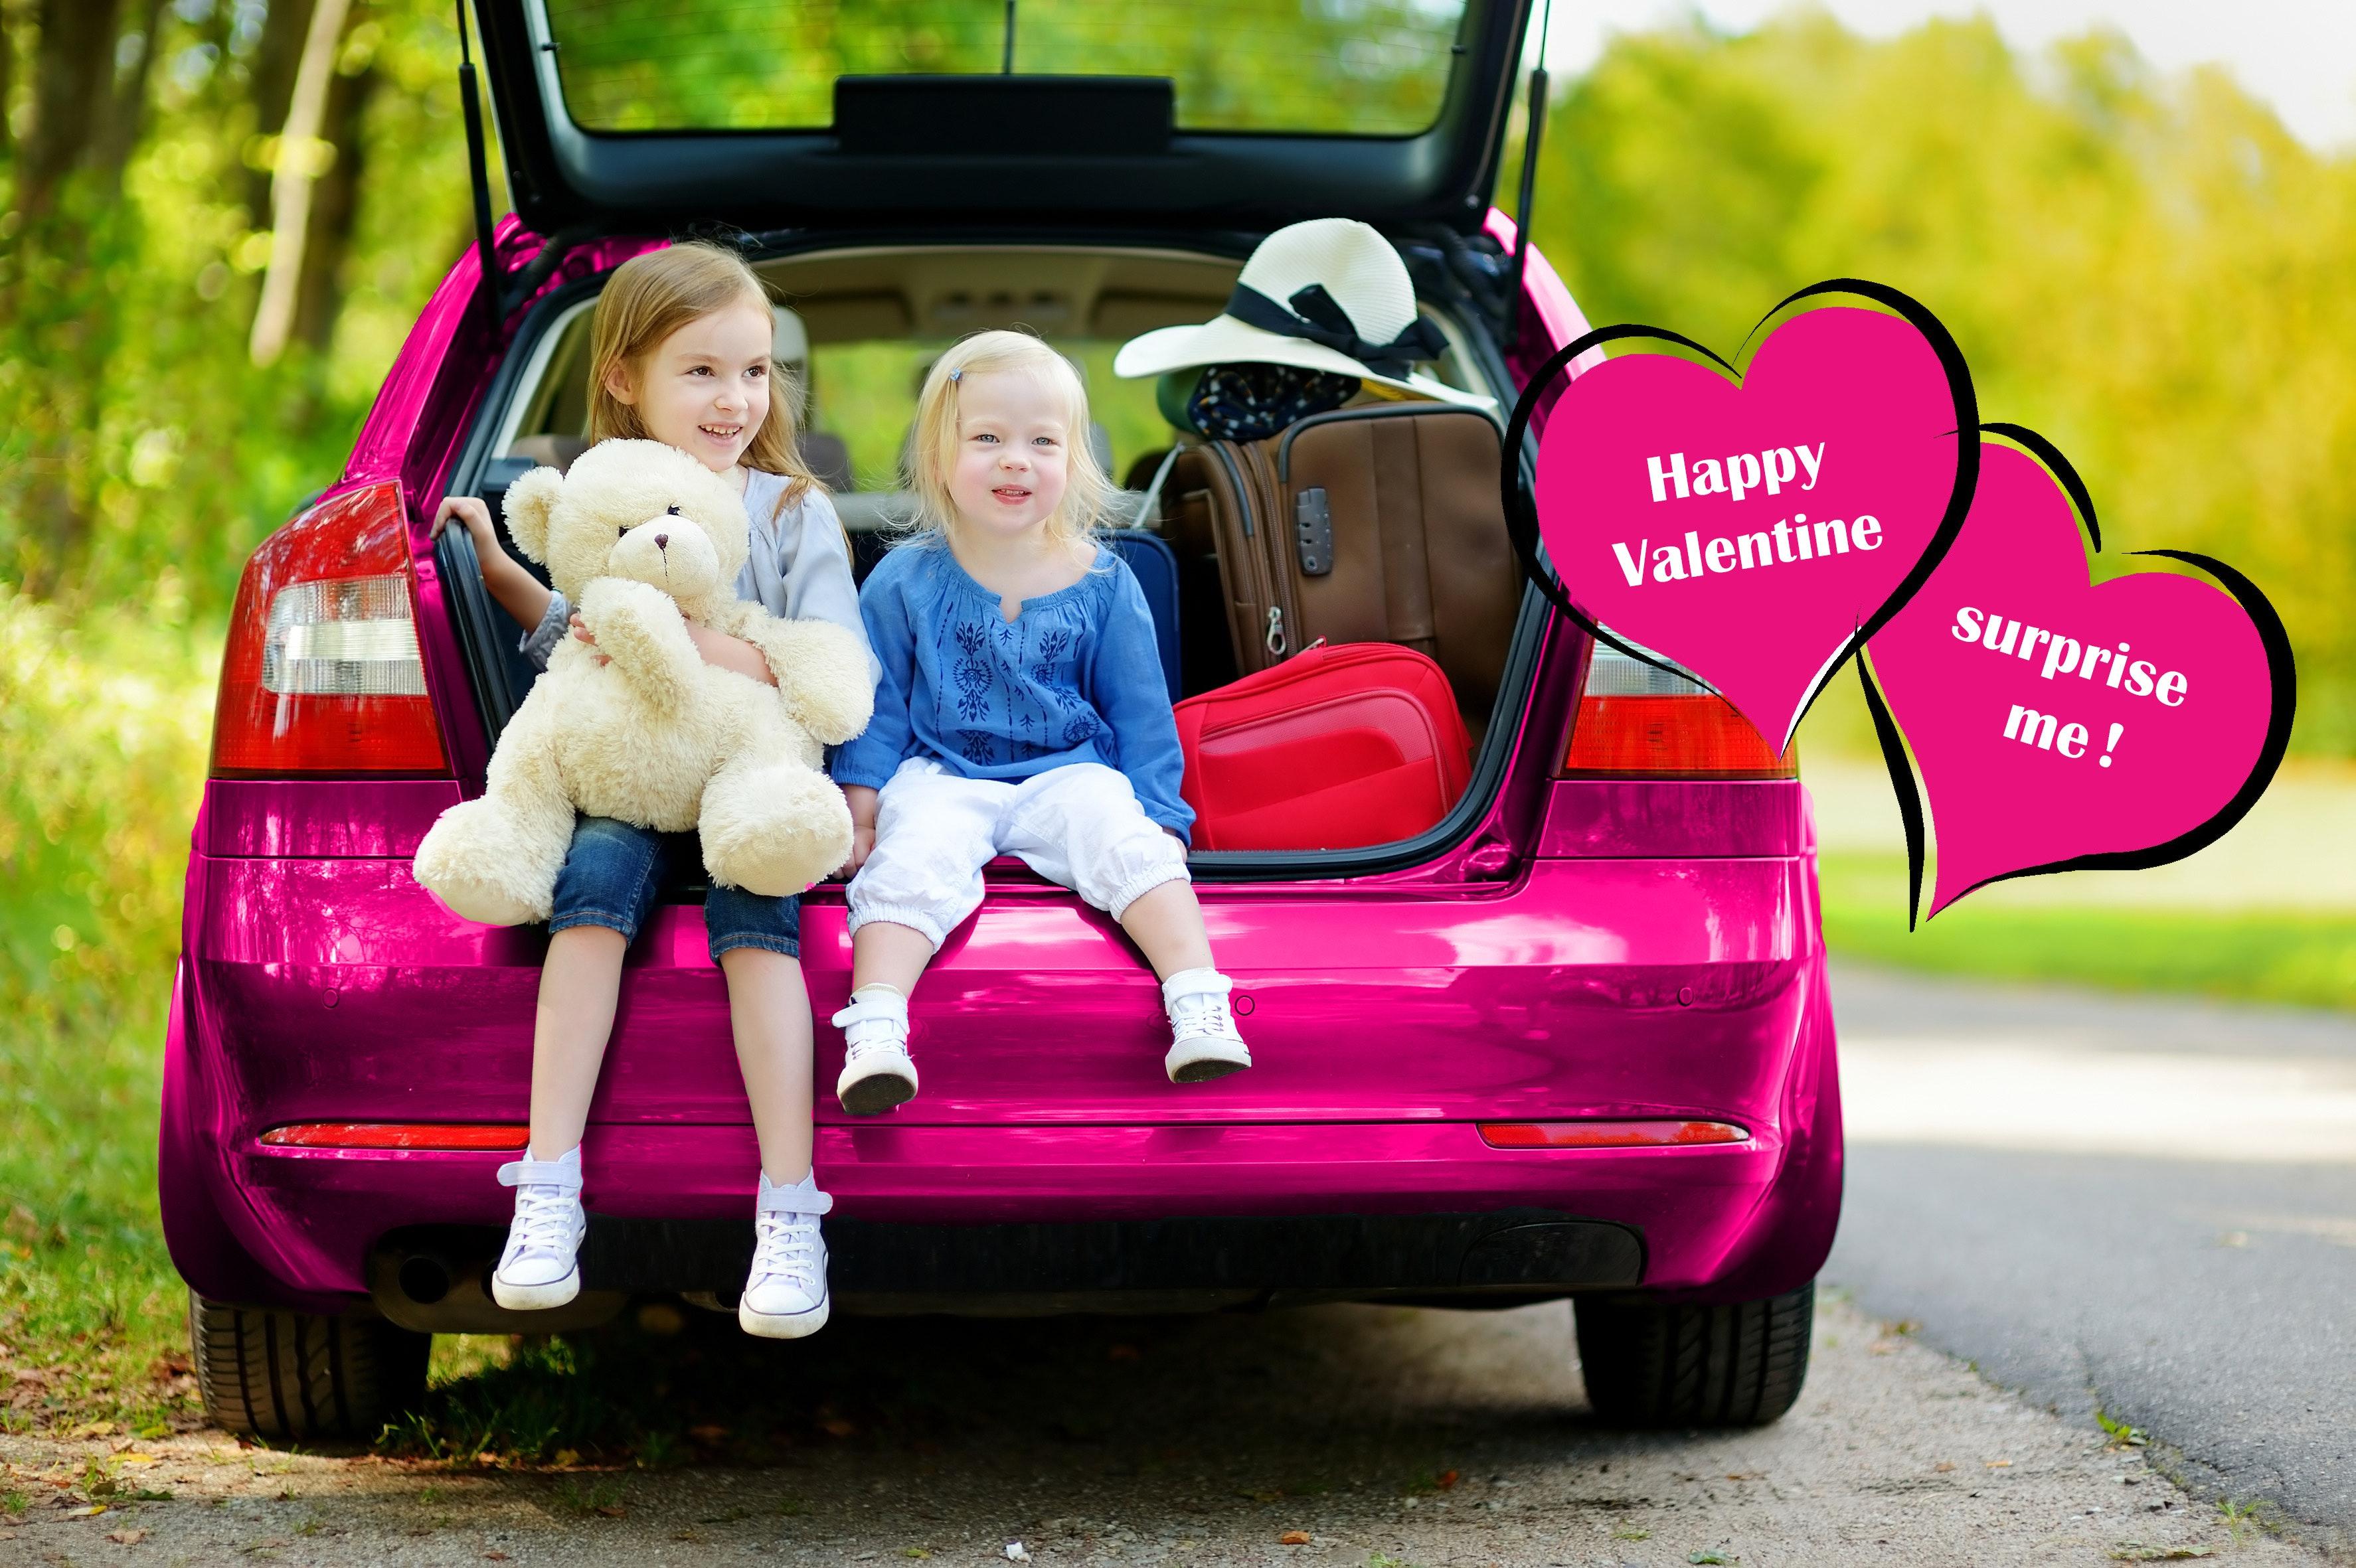 Valentijn, surprise me!